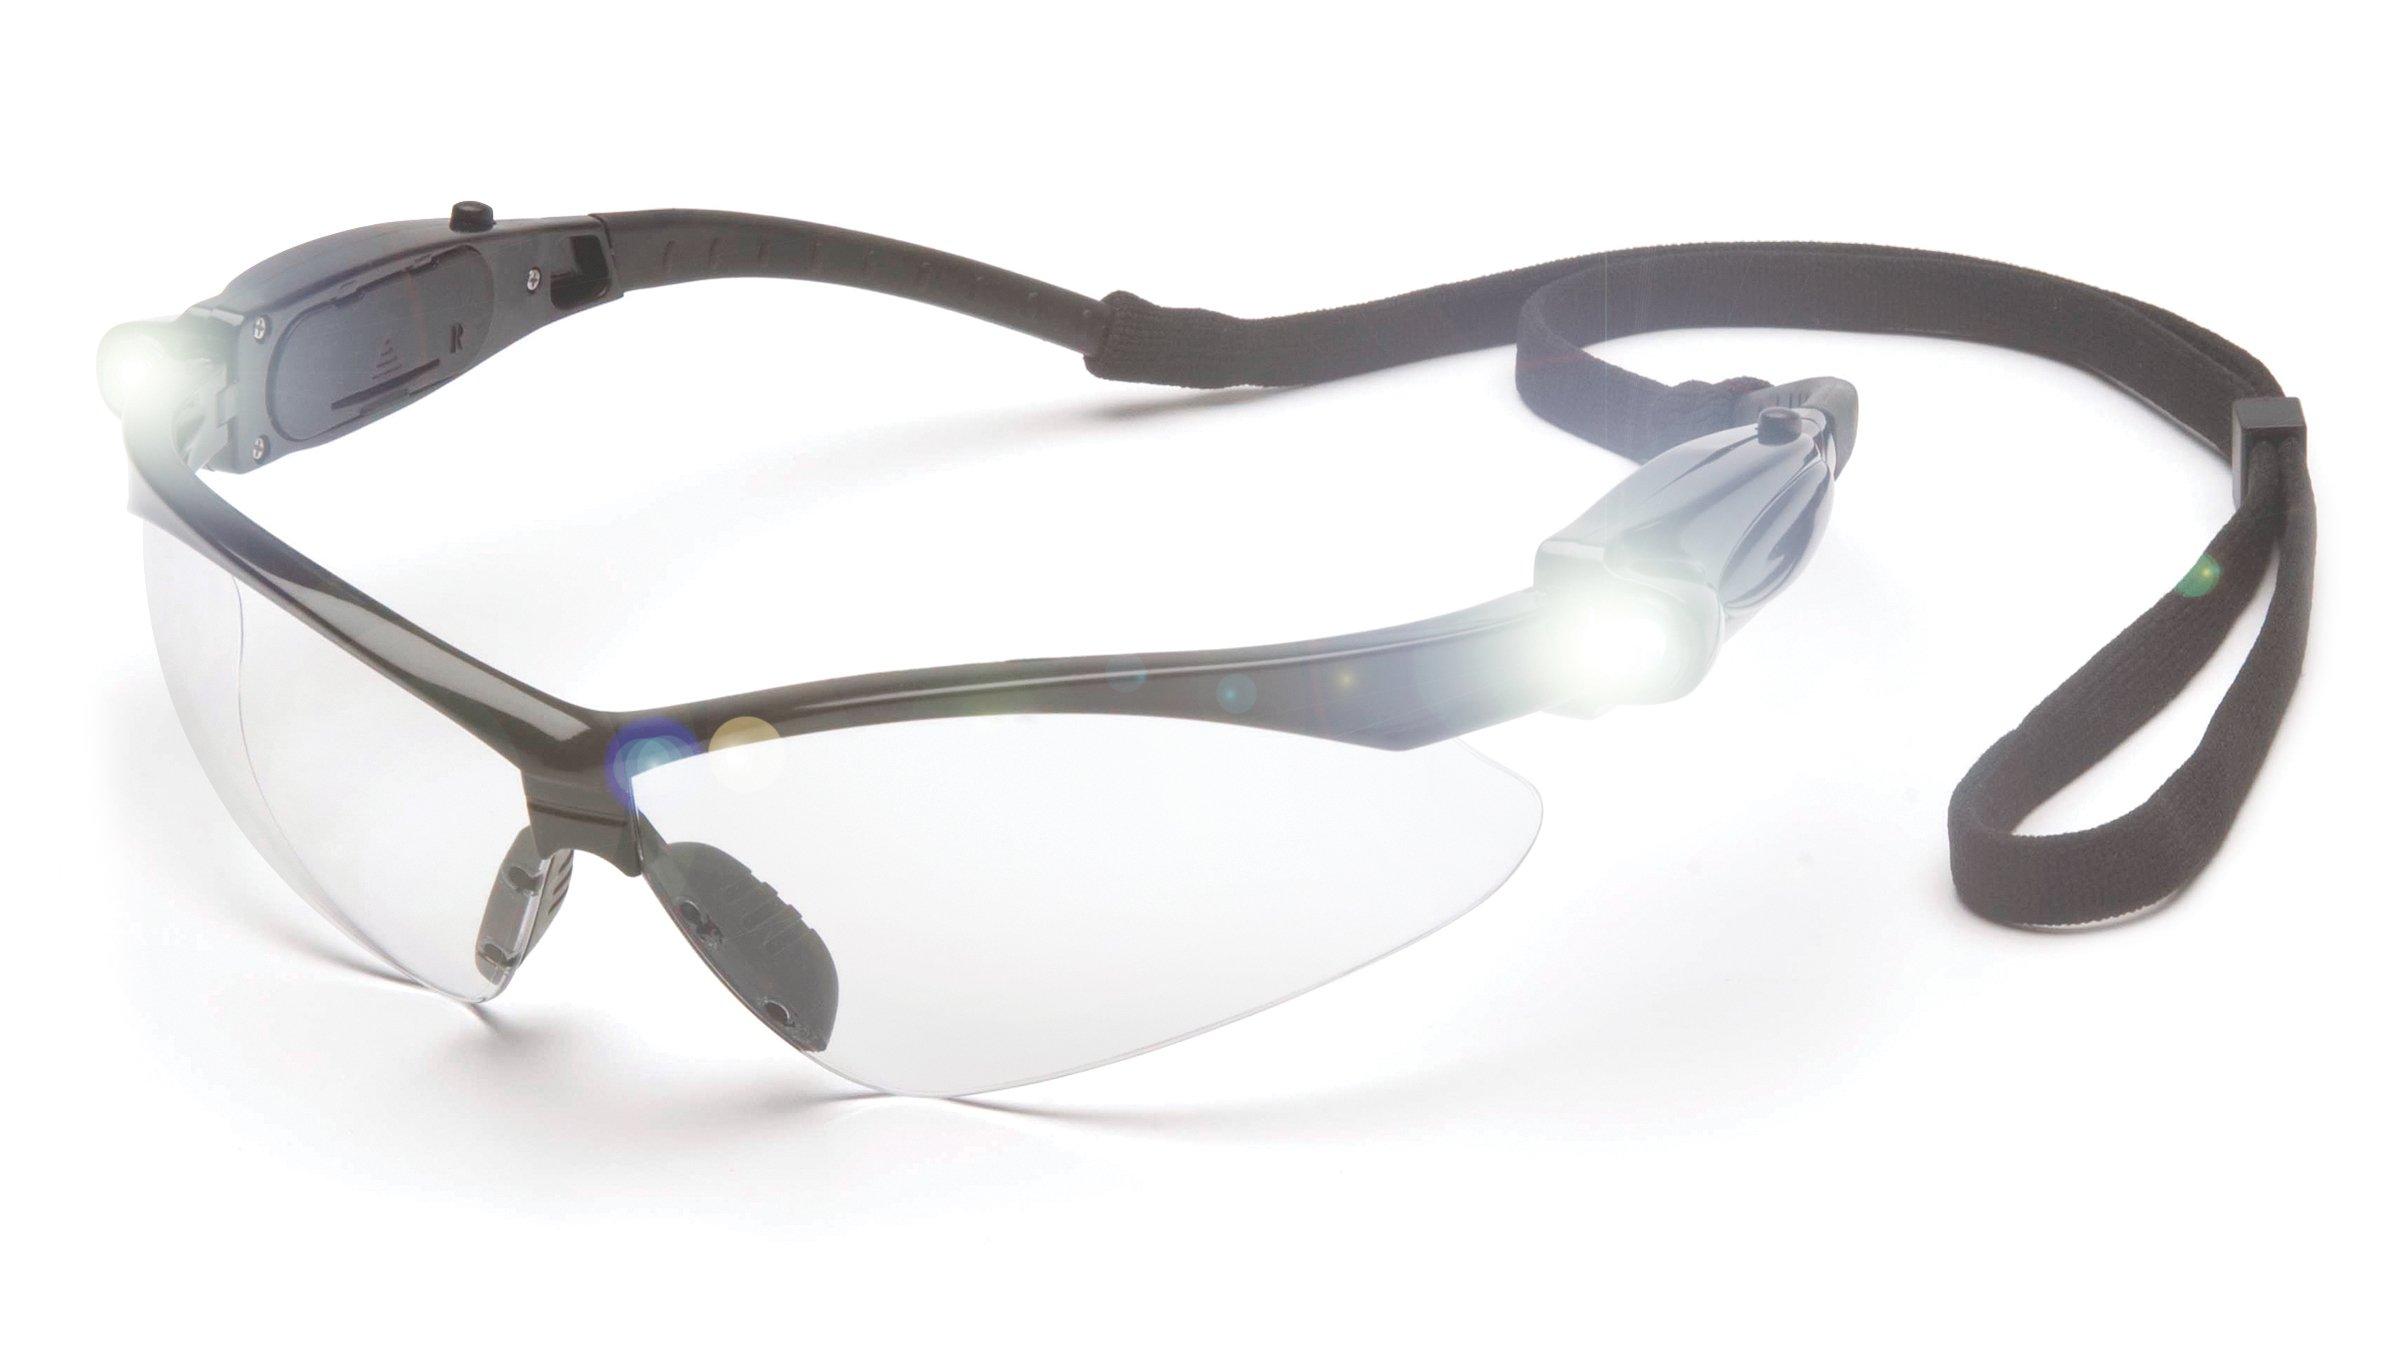 Pyramex SB6310SPLED LED Safety Glasses with